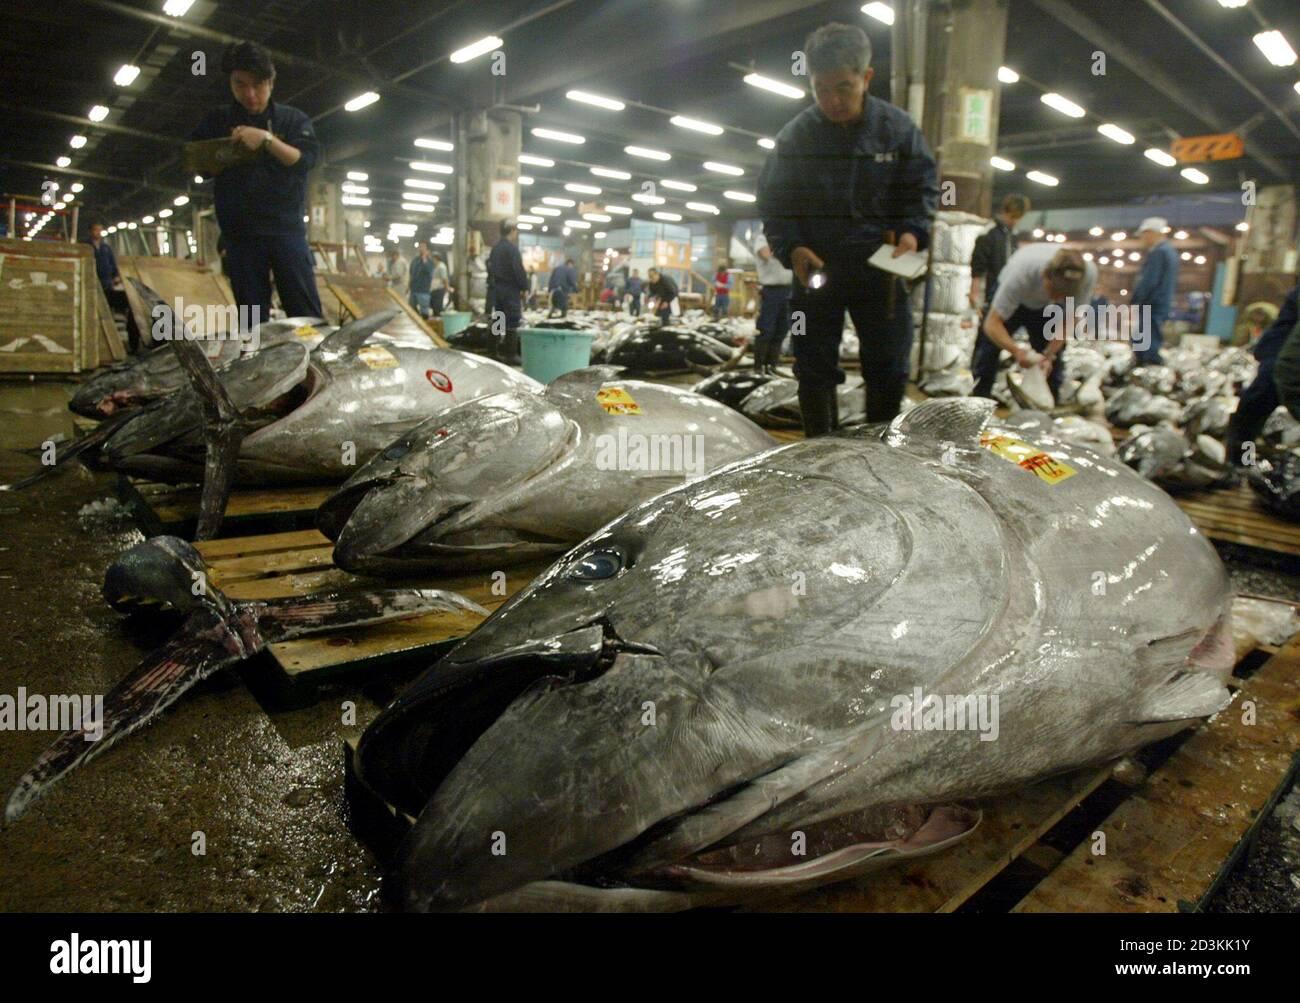 Biggest fish worlds 10 Largest